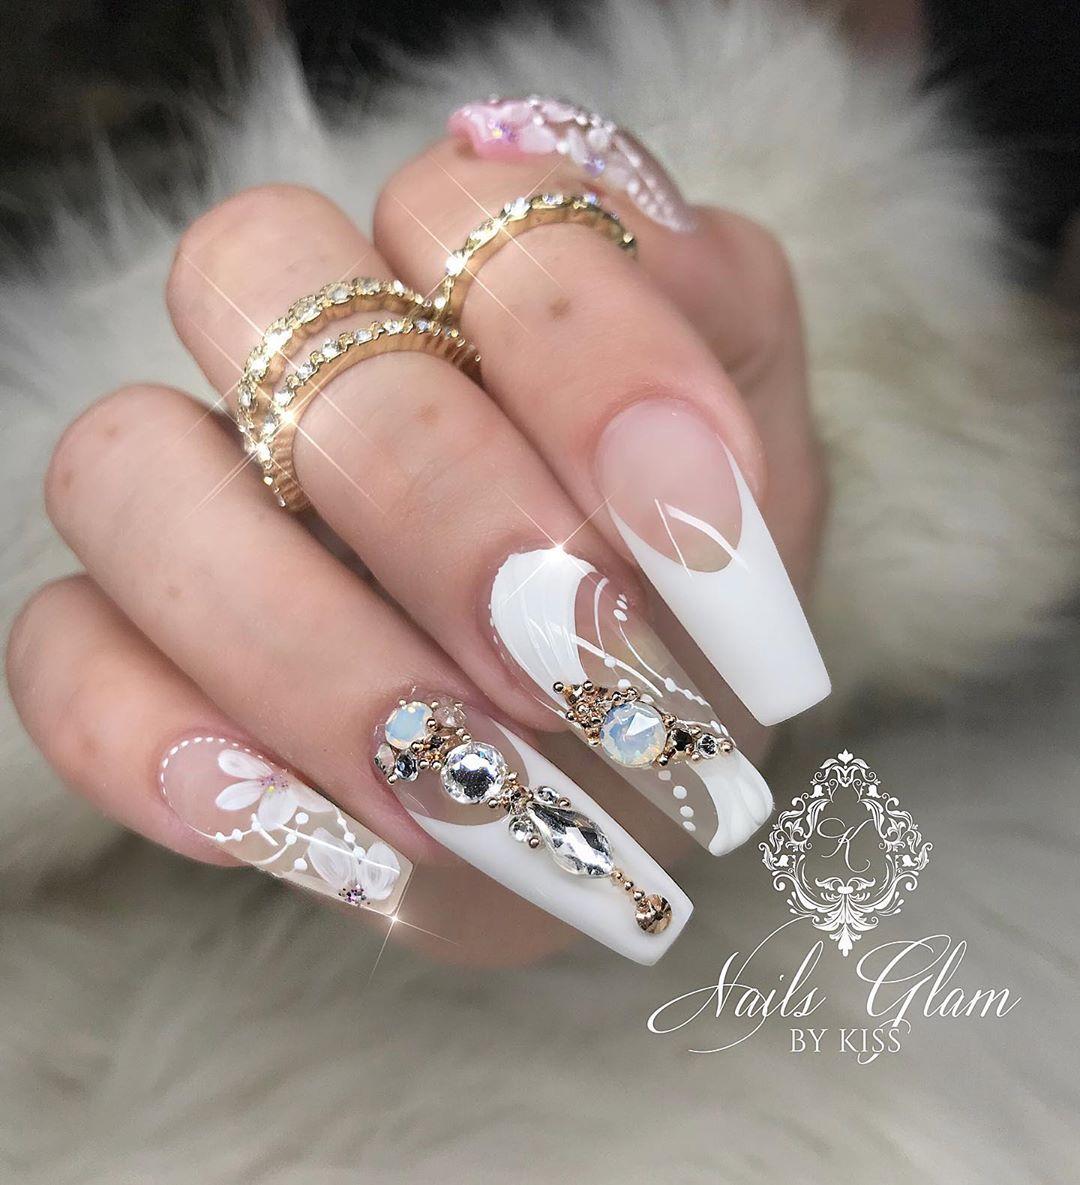 Perfect for a wedding  ....nailsonfleek